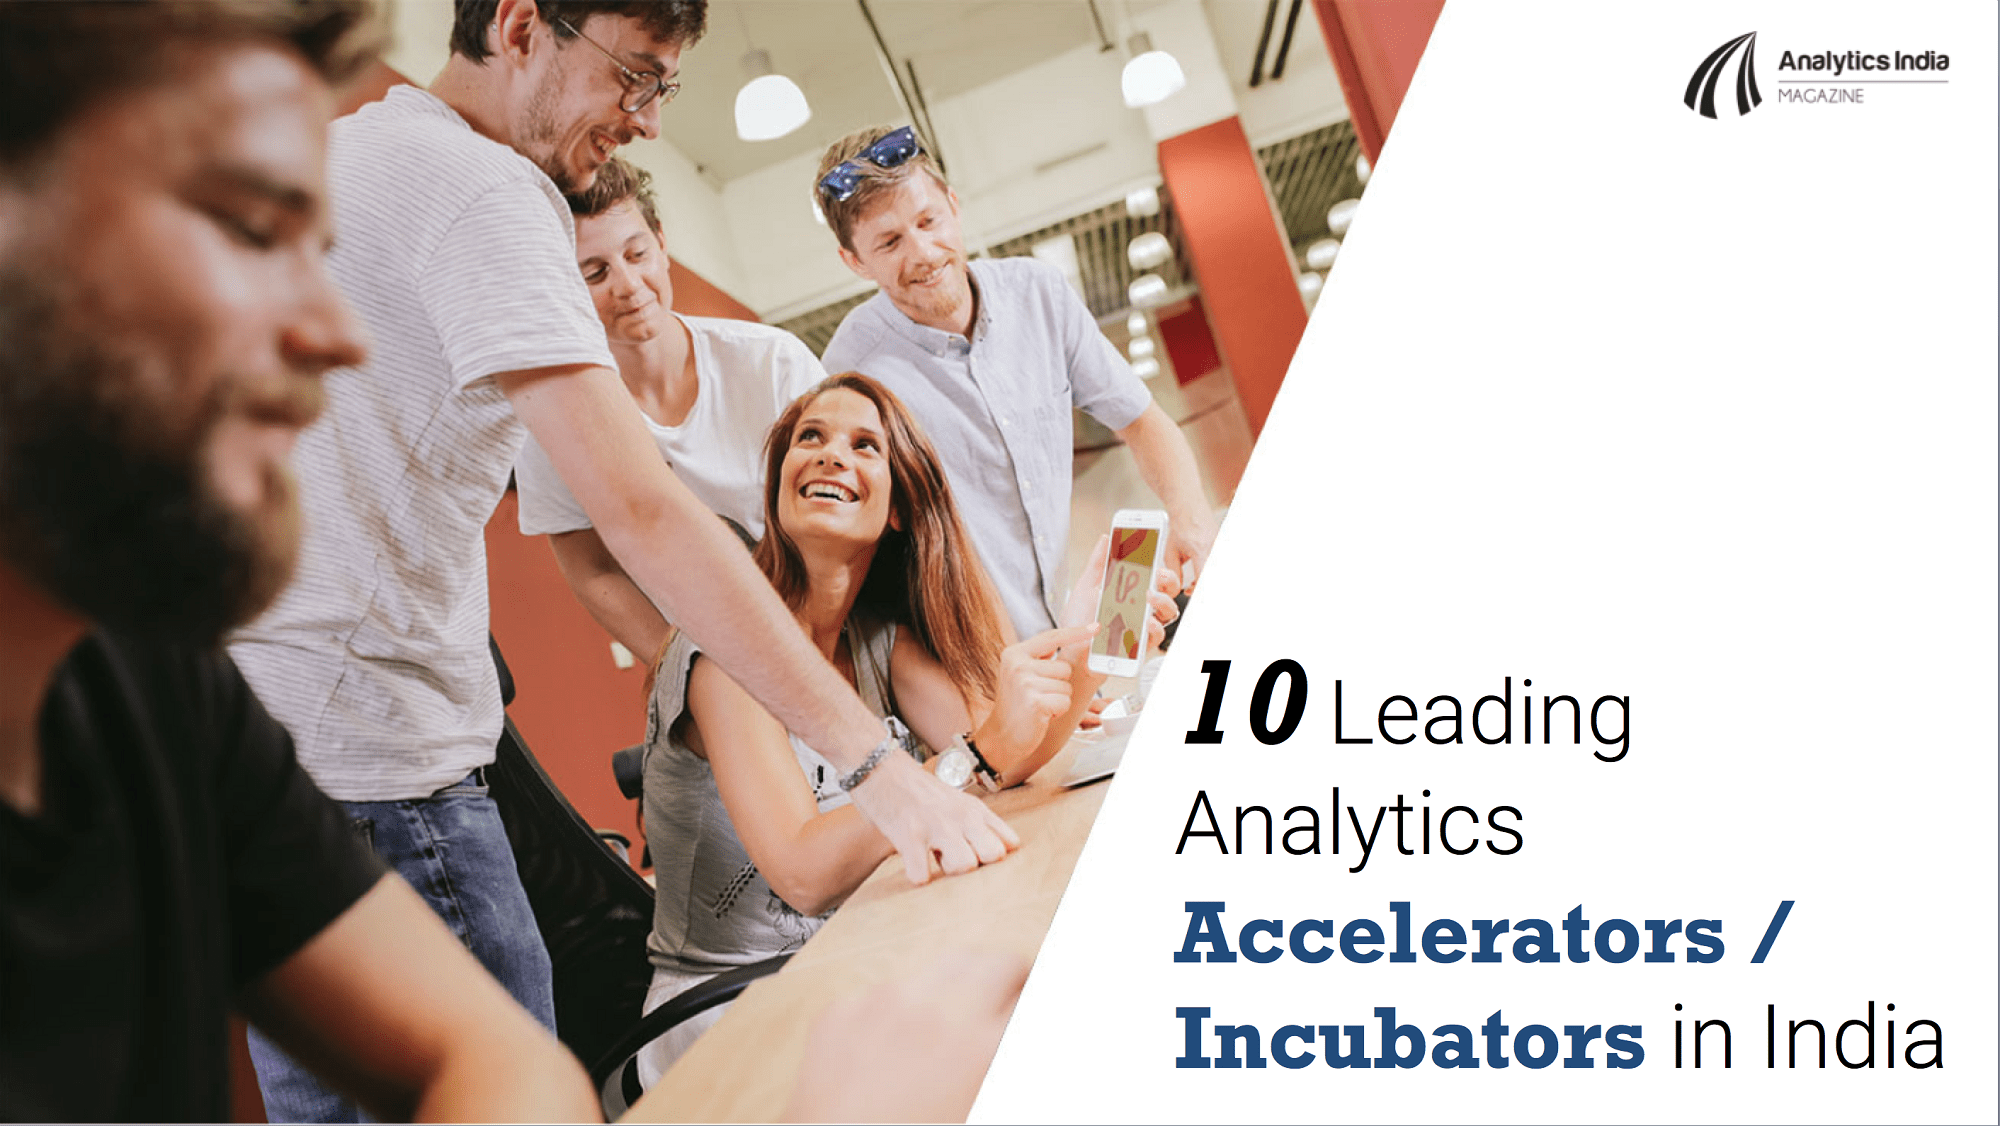 10 leading Analytics Accelerators/Incubators in India